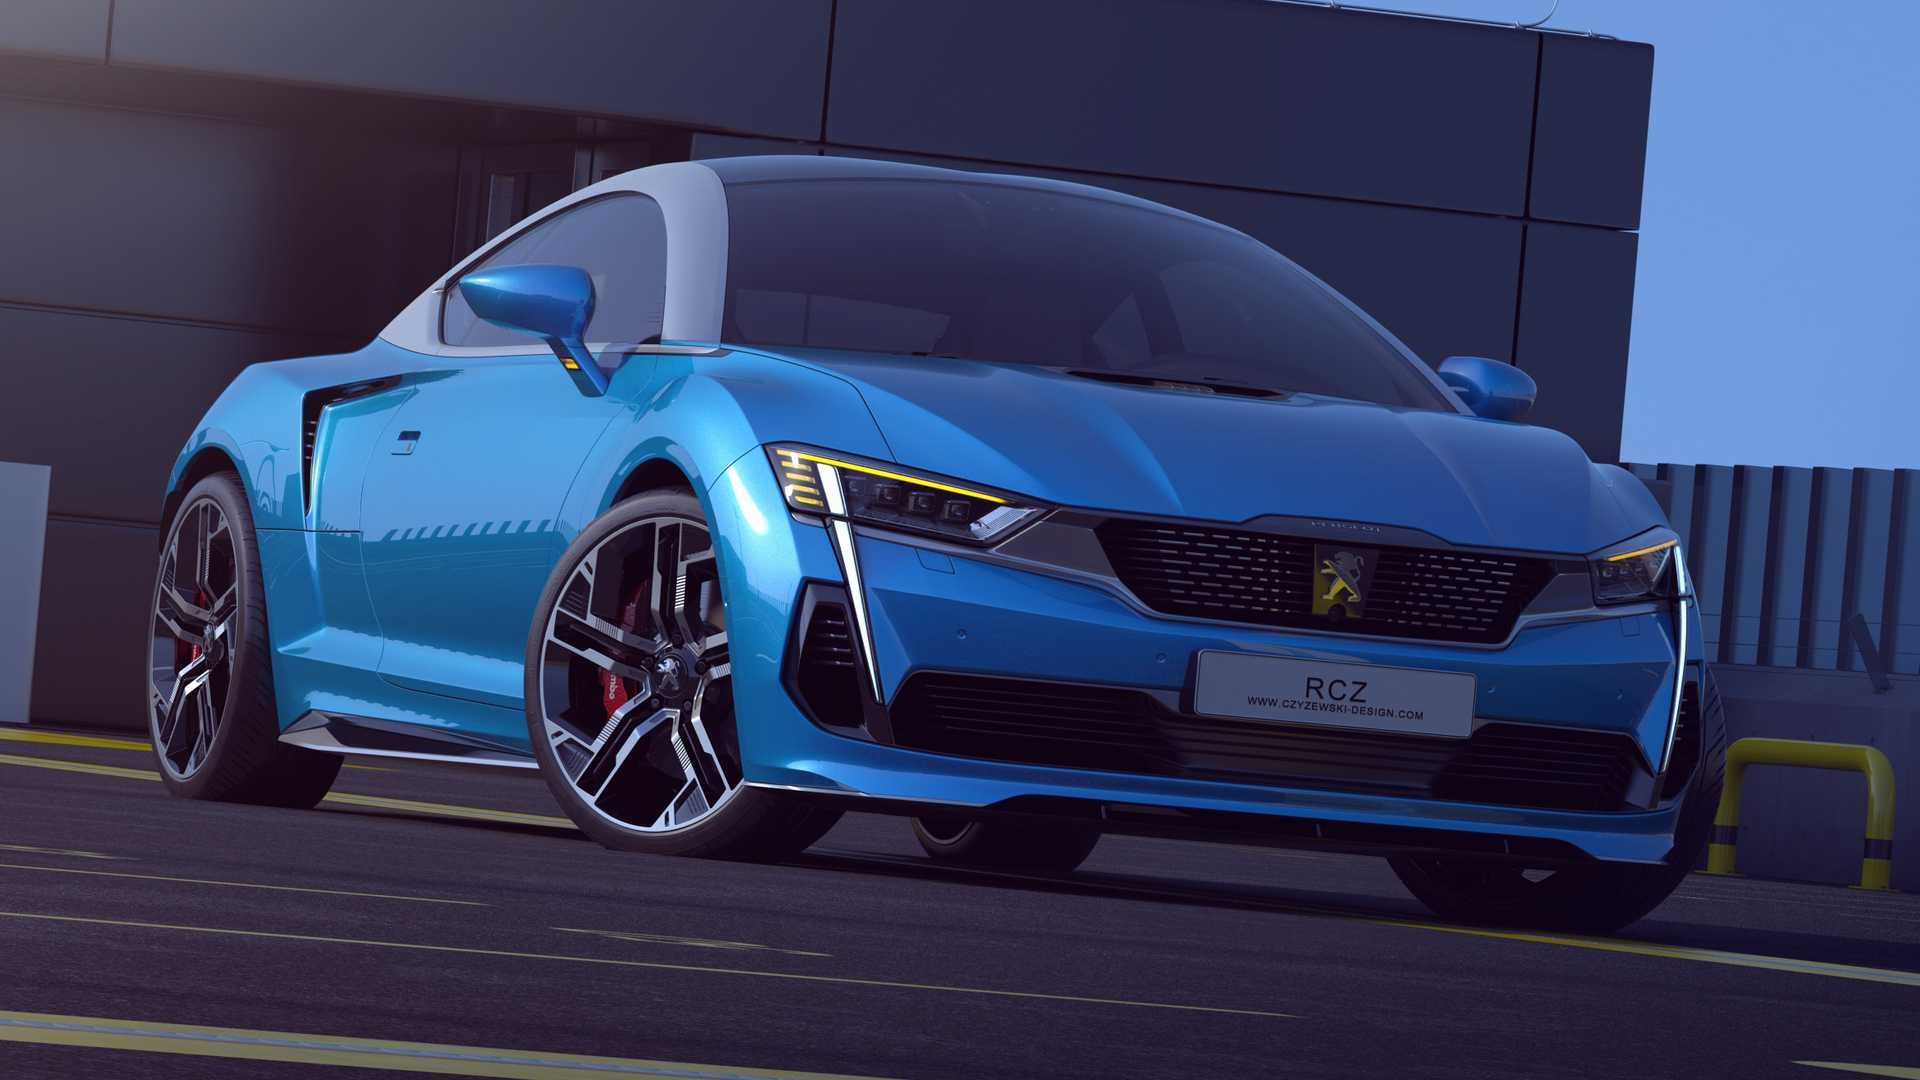 2020_Peugeot_RCZ_rendering_0002